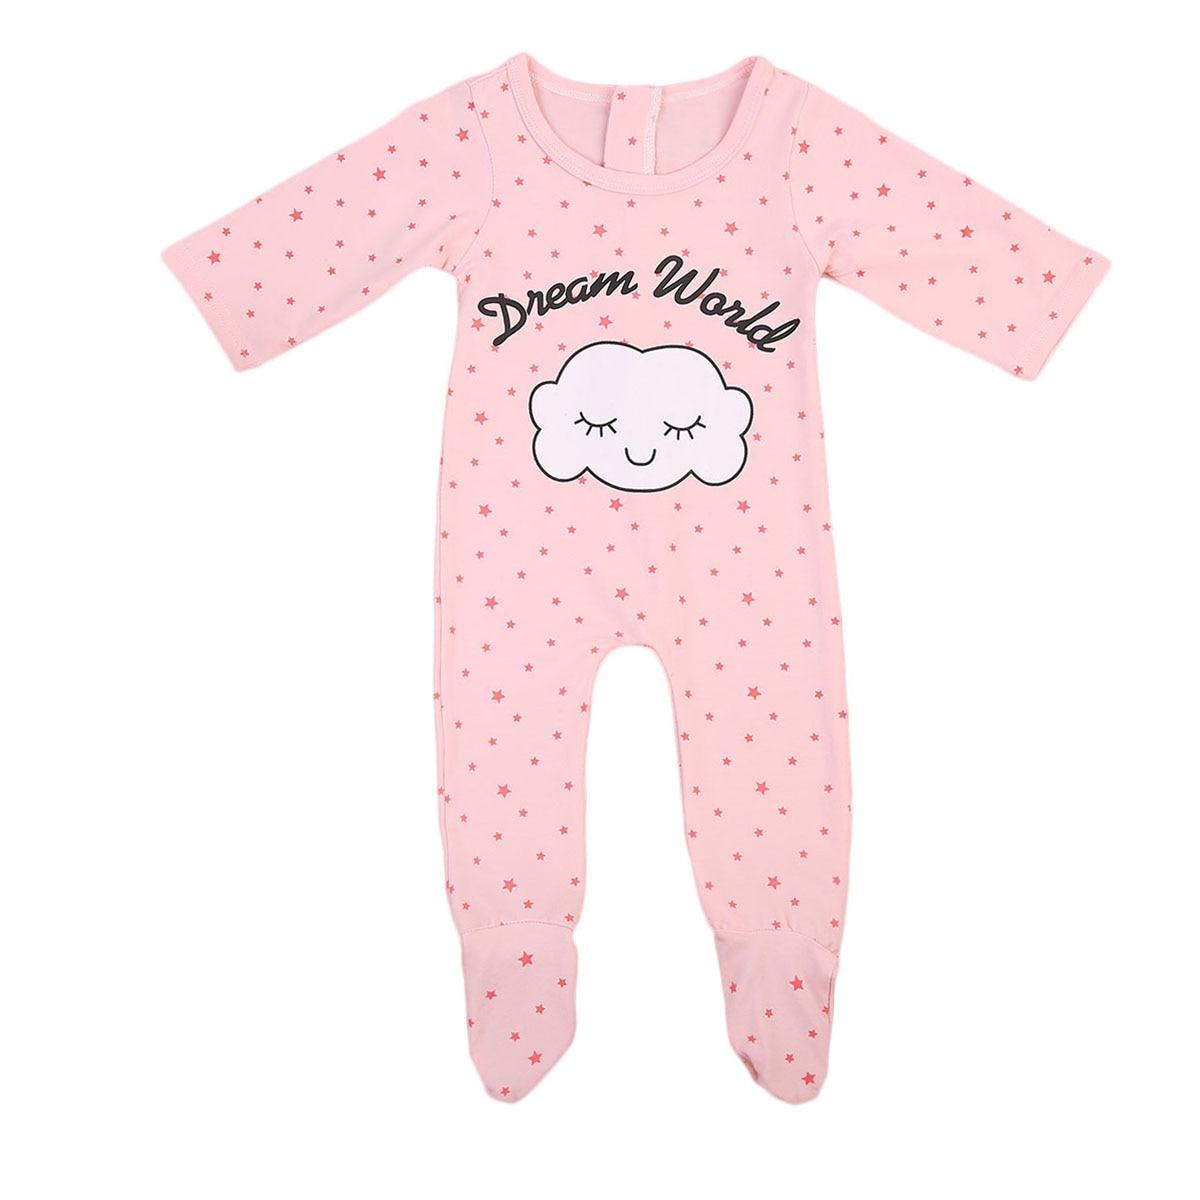 Dream World Babies Little Stars Printing Footy Newborn Baby Girls Pink Cloud Footies Pajamas Sleepwear Pyjamas Clothes Playsuit